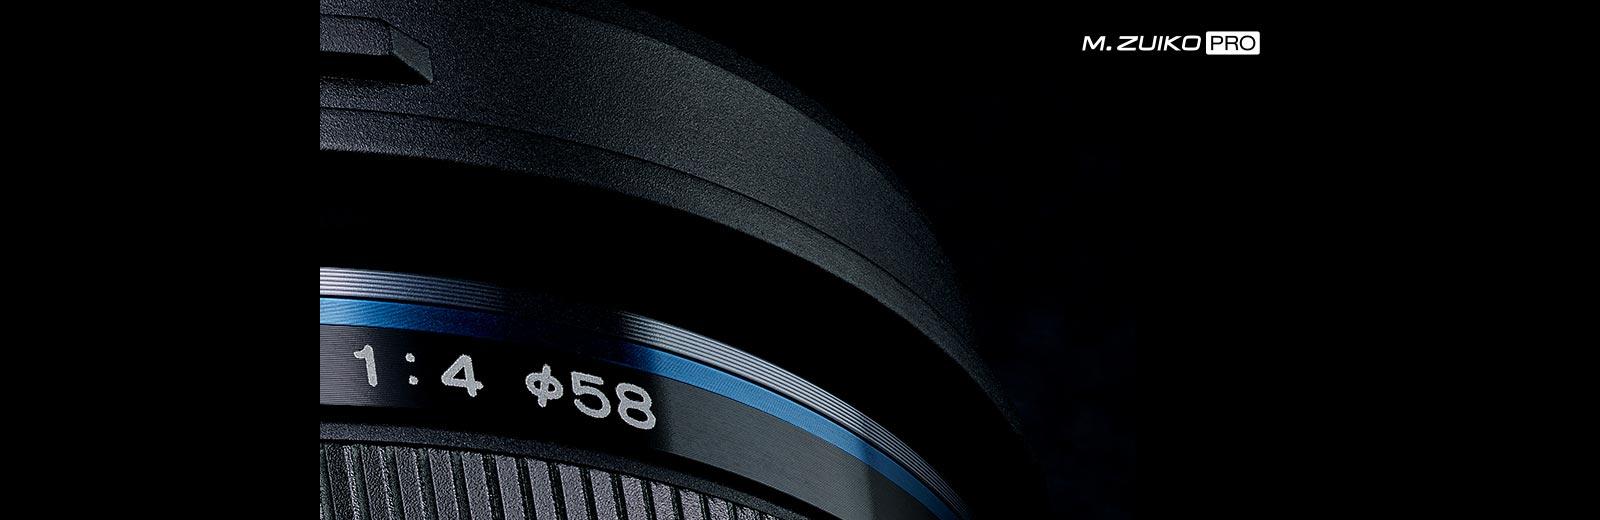 M Zuiko Pro 12-45mm